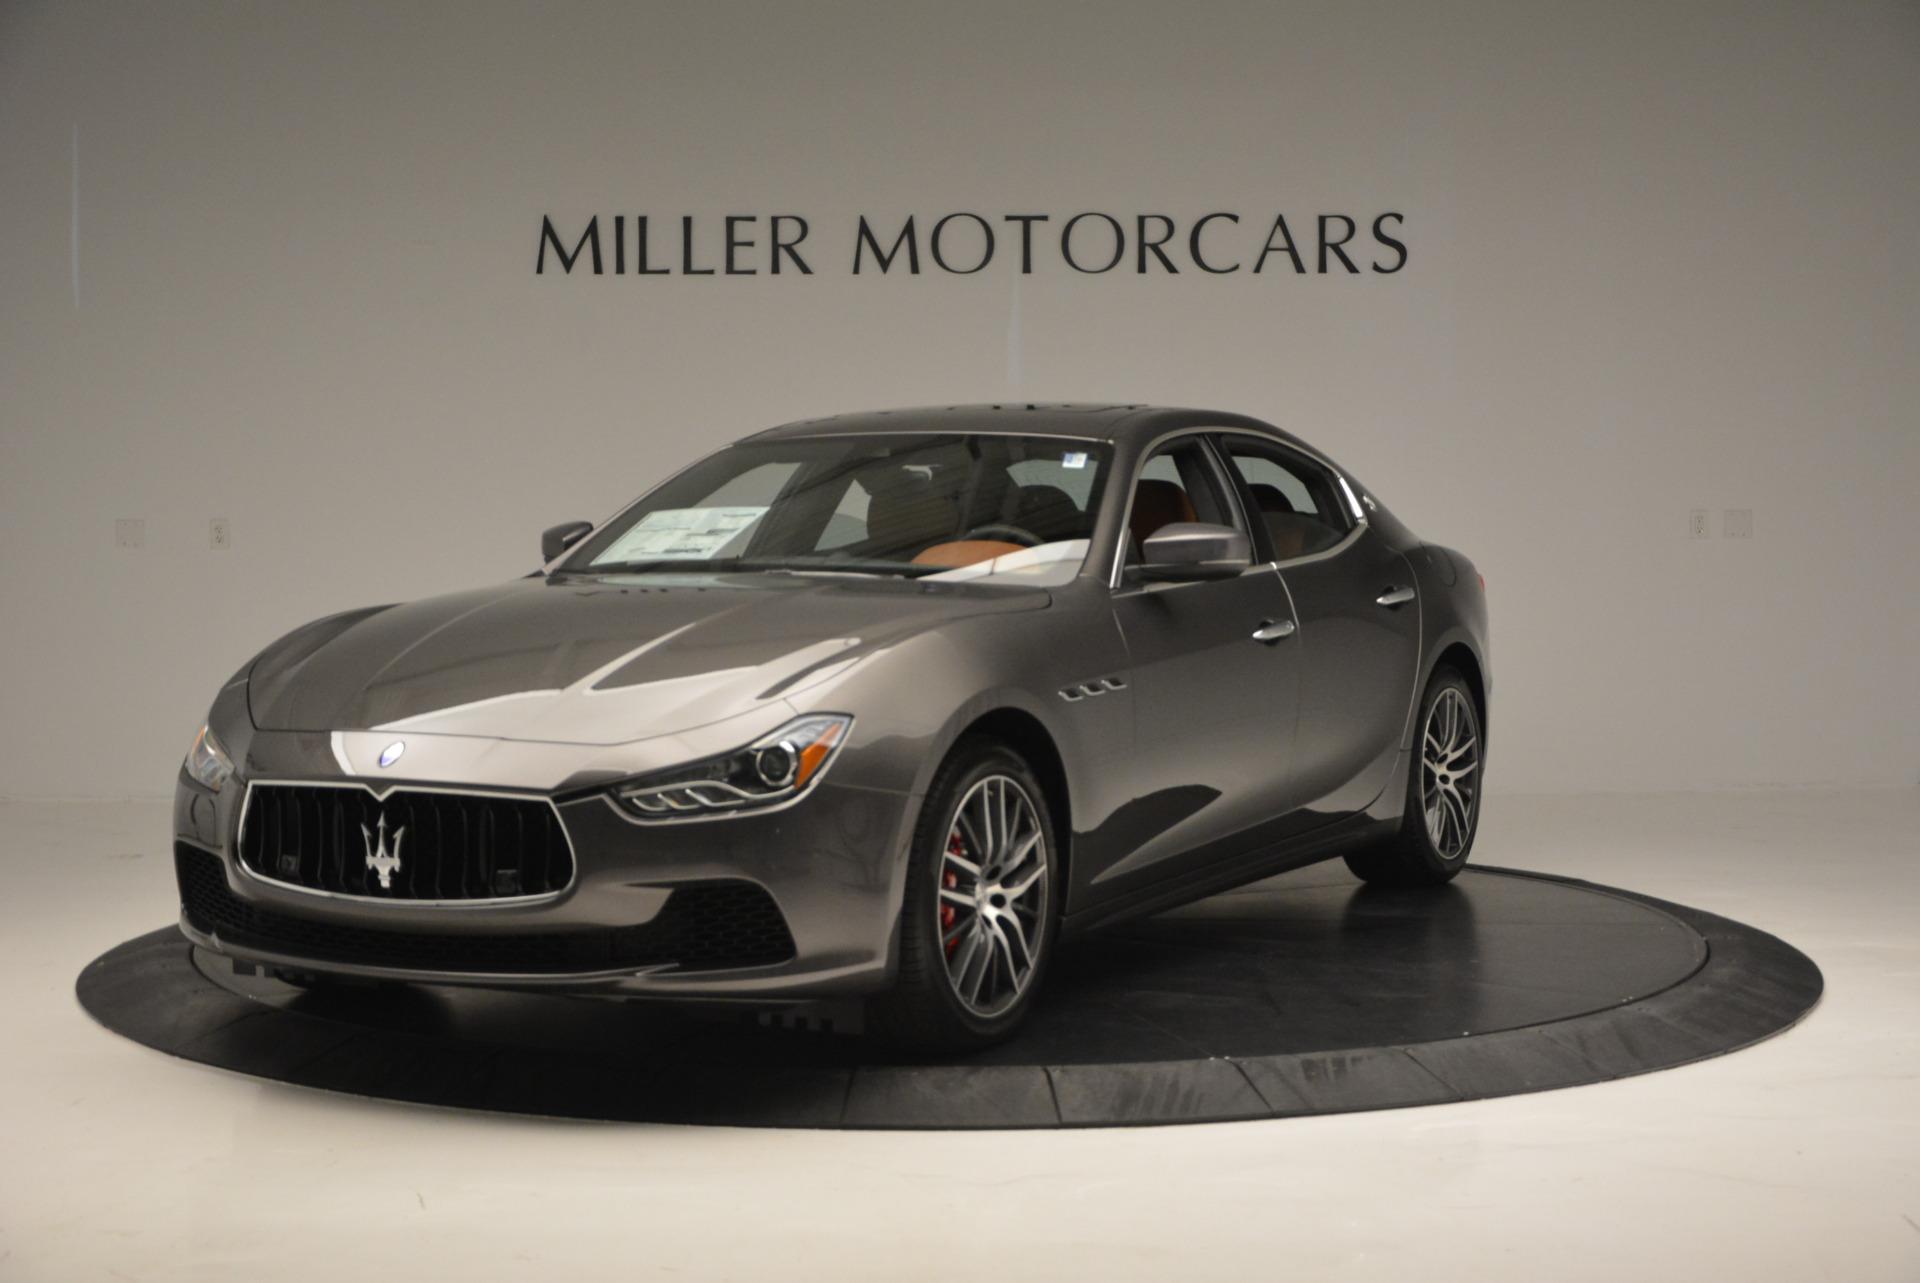 New 2017 Maserati Ghibli S Q4 For Sale In Greenwich, CT 573_main